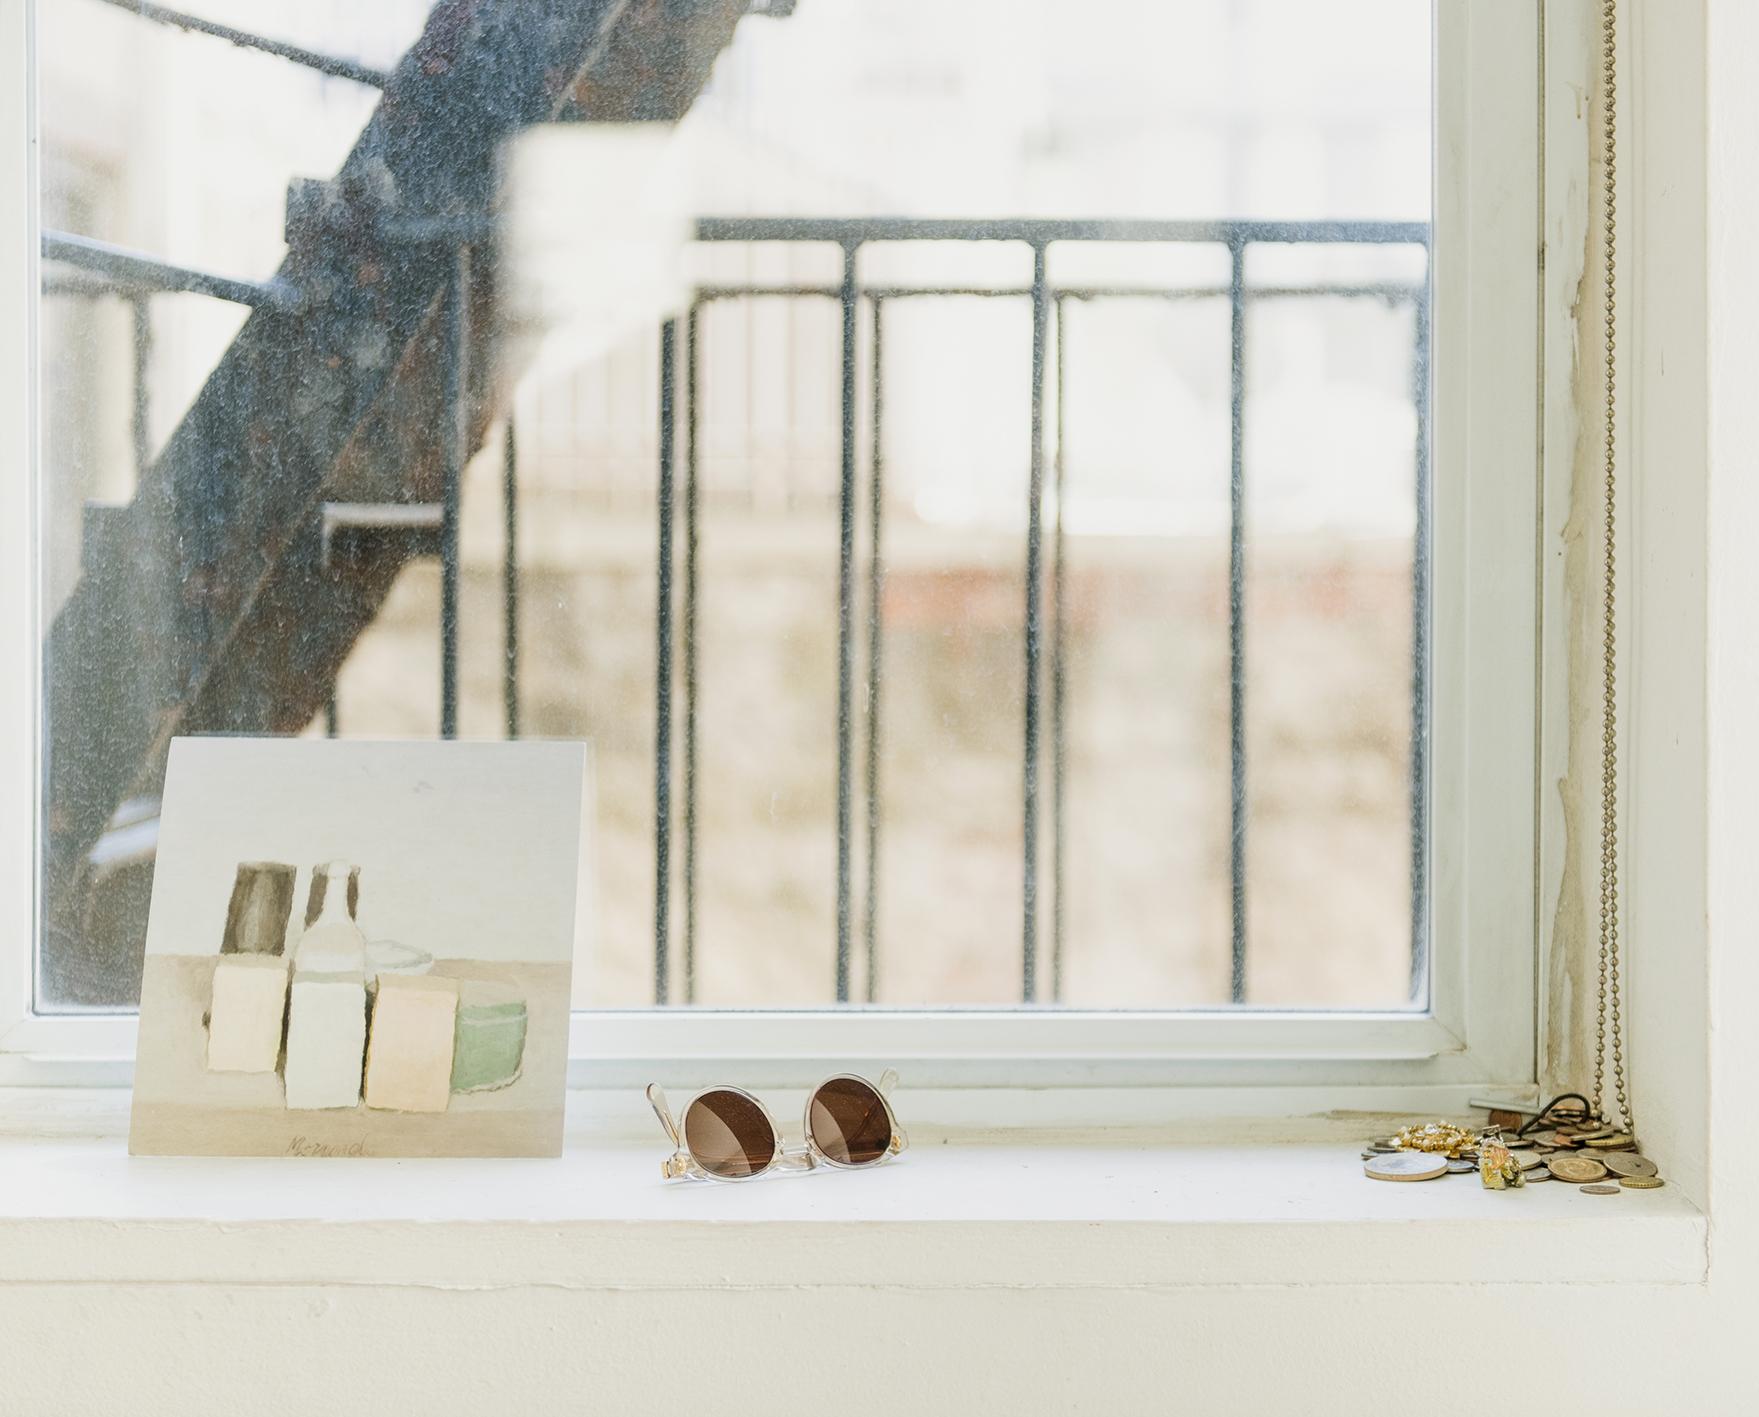 omar-sosa-apartamento-the-laterals-6.jpg